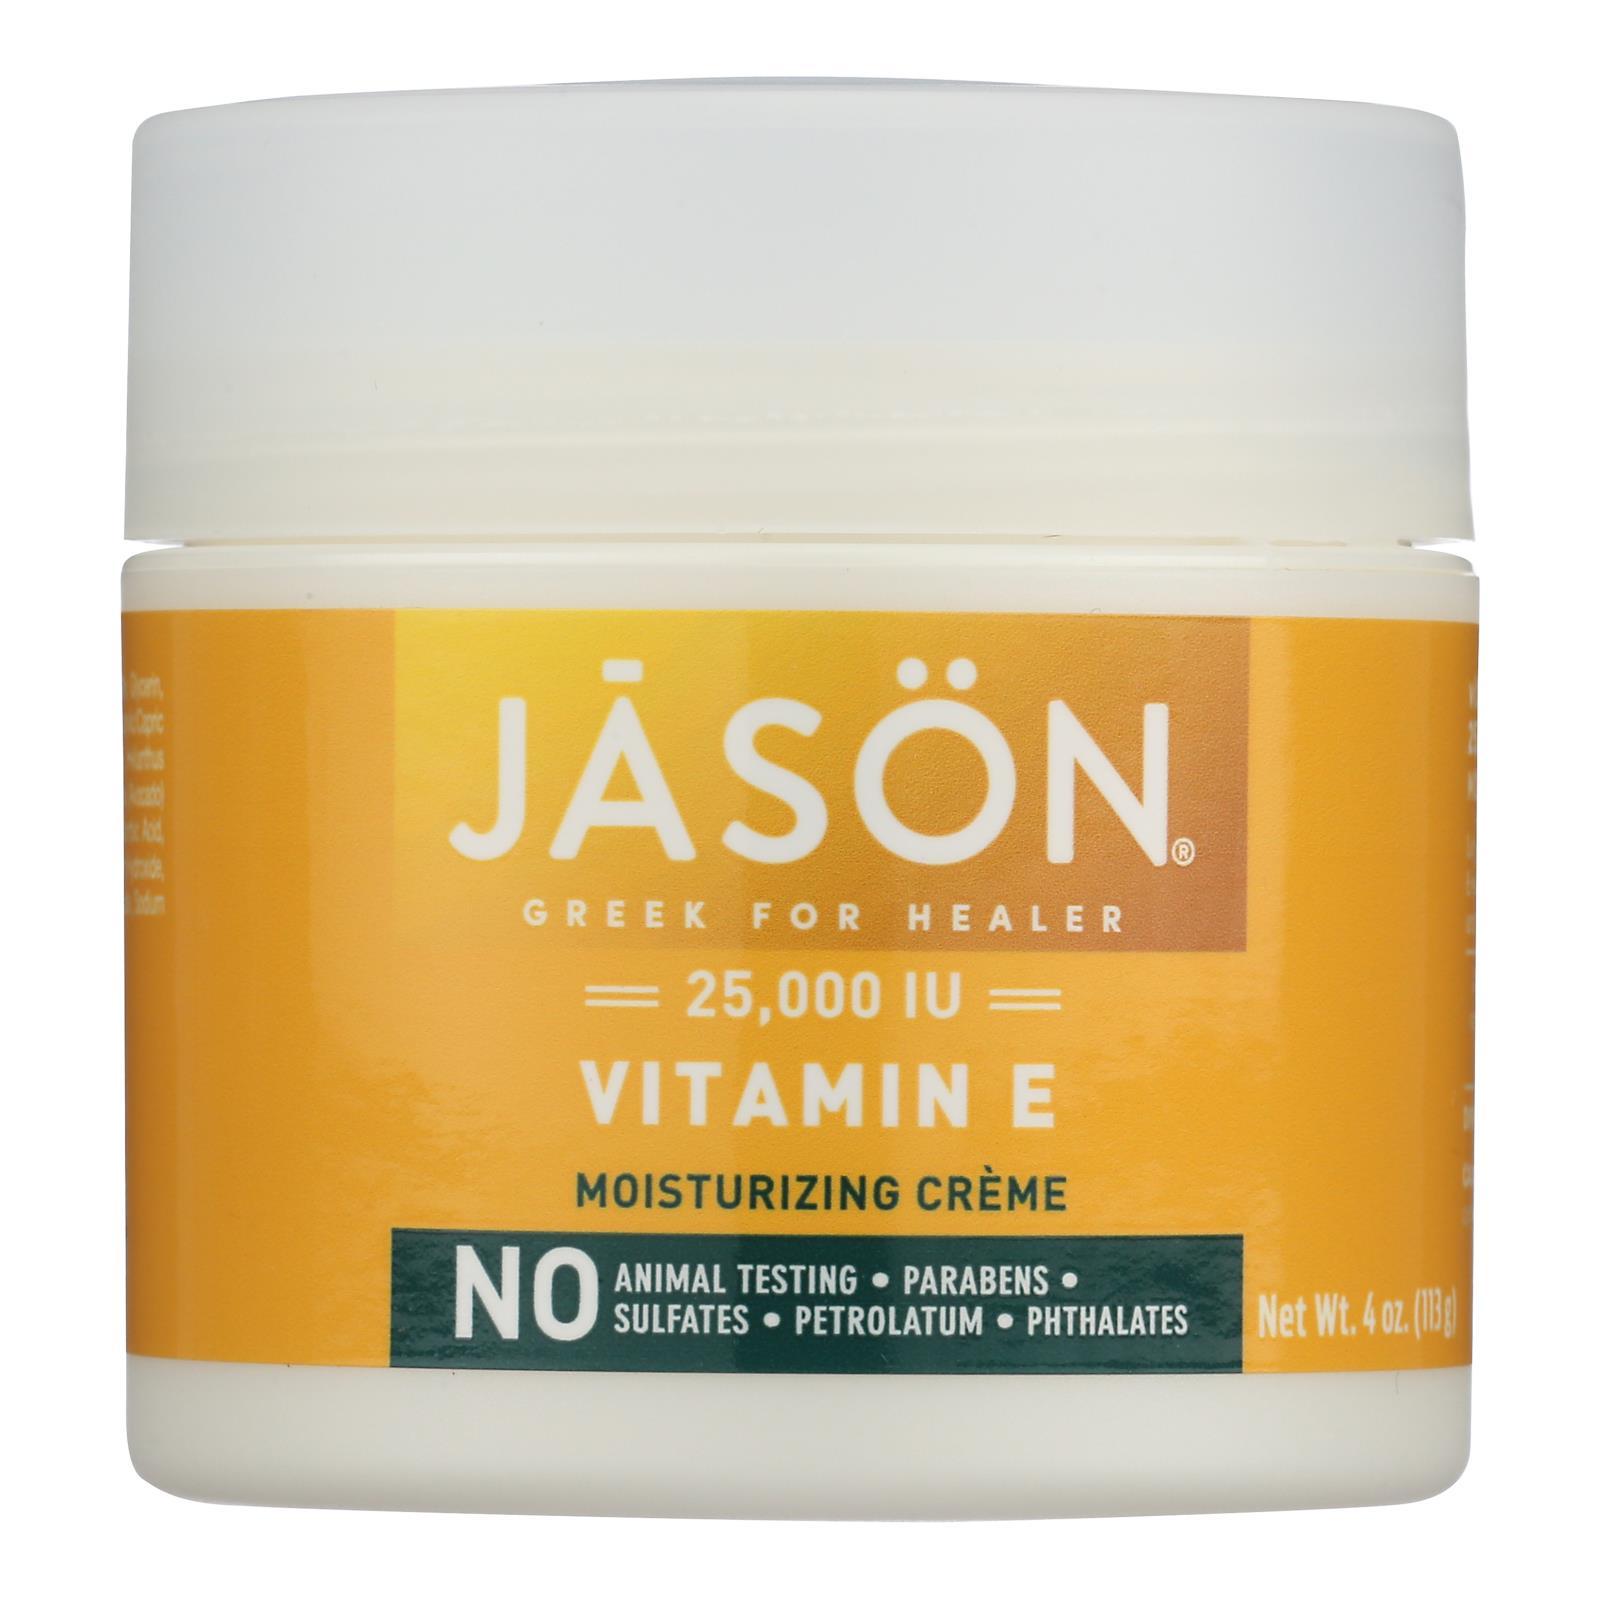 Jason Moisturizing Creme Vitamin E Age Renewal Fragrance Free - 25000 IU - 4 oz